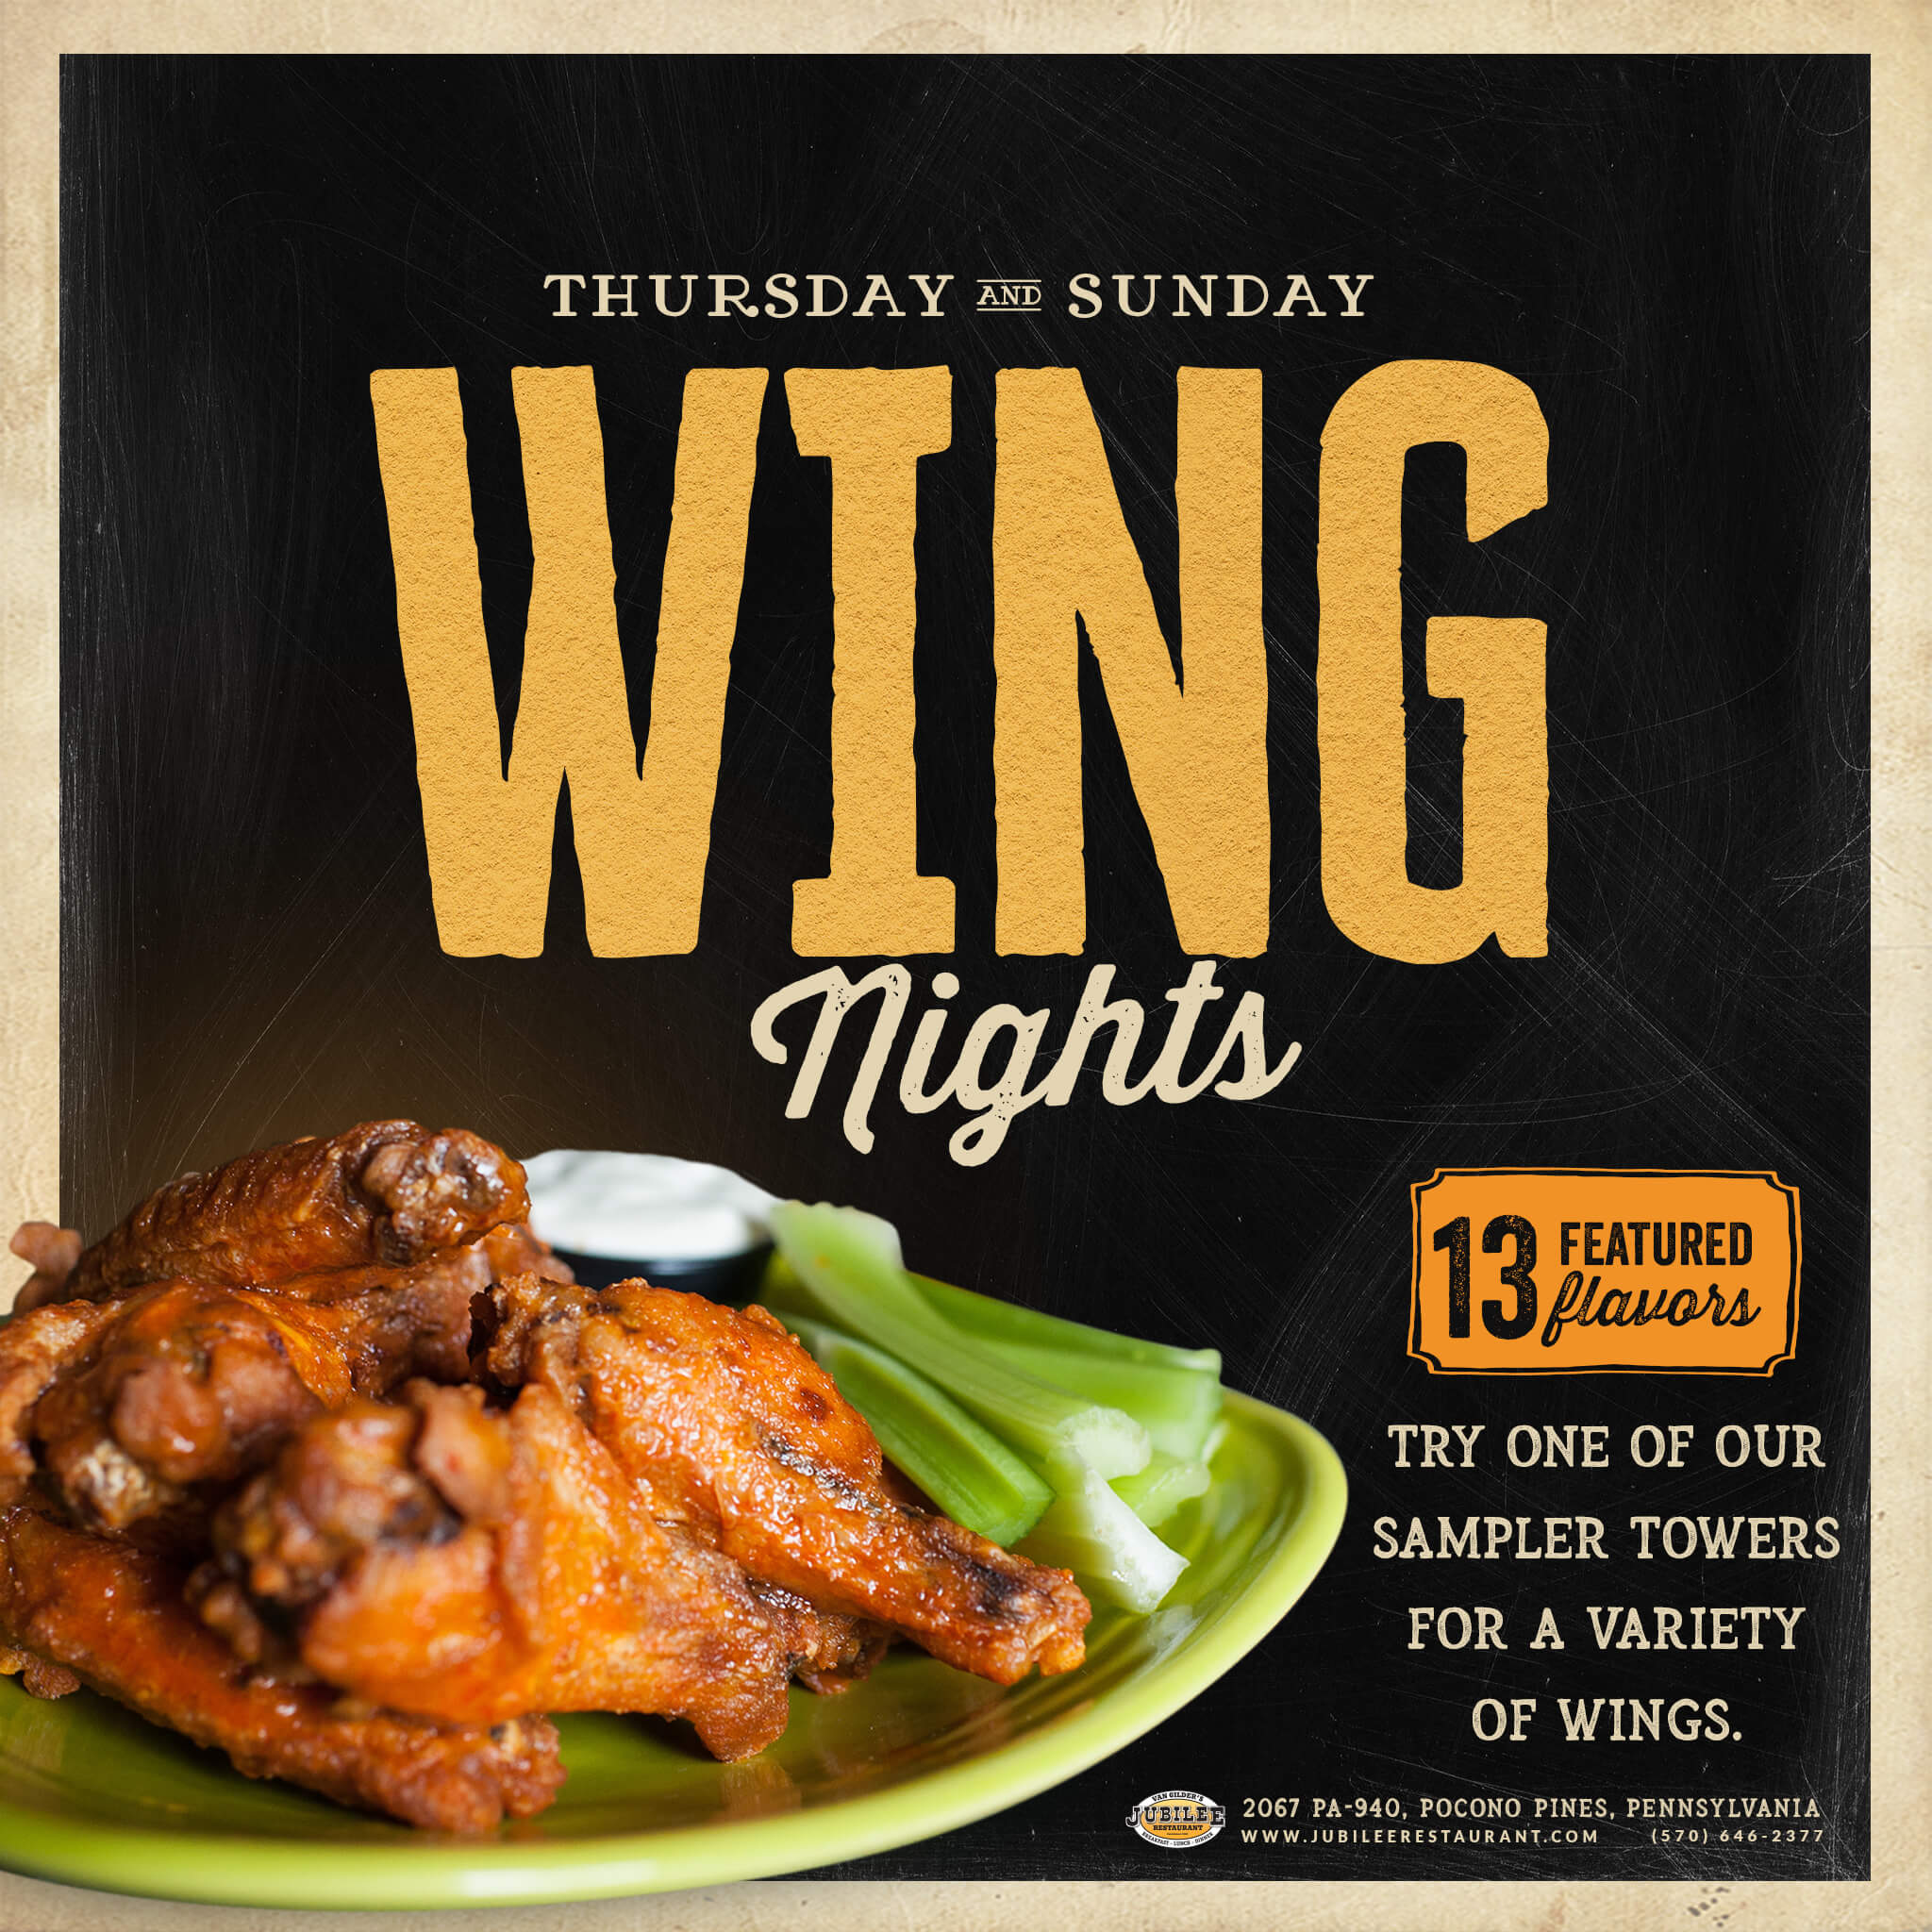 2019 february Jubilee wing nights social (1)